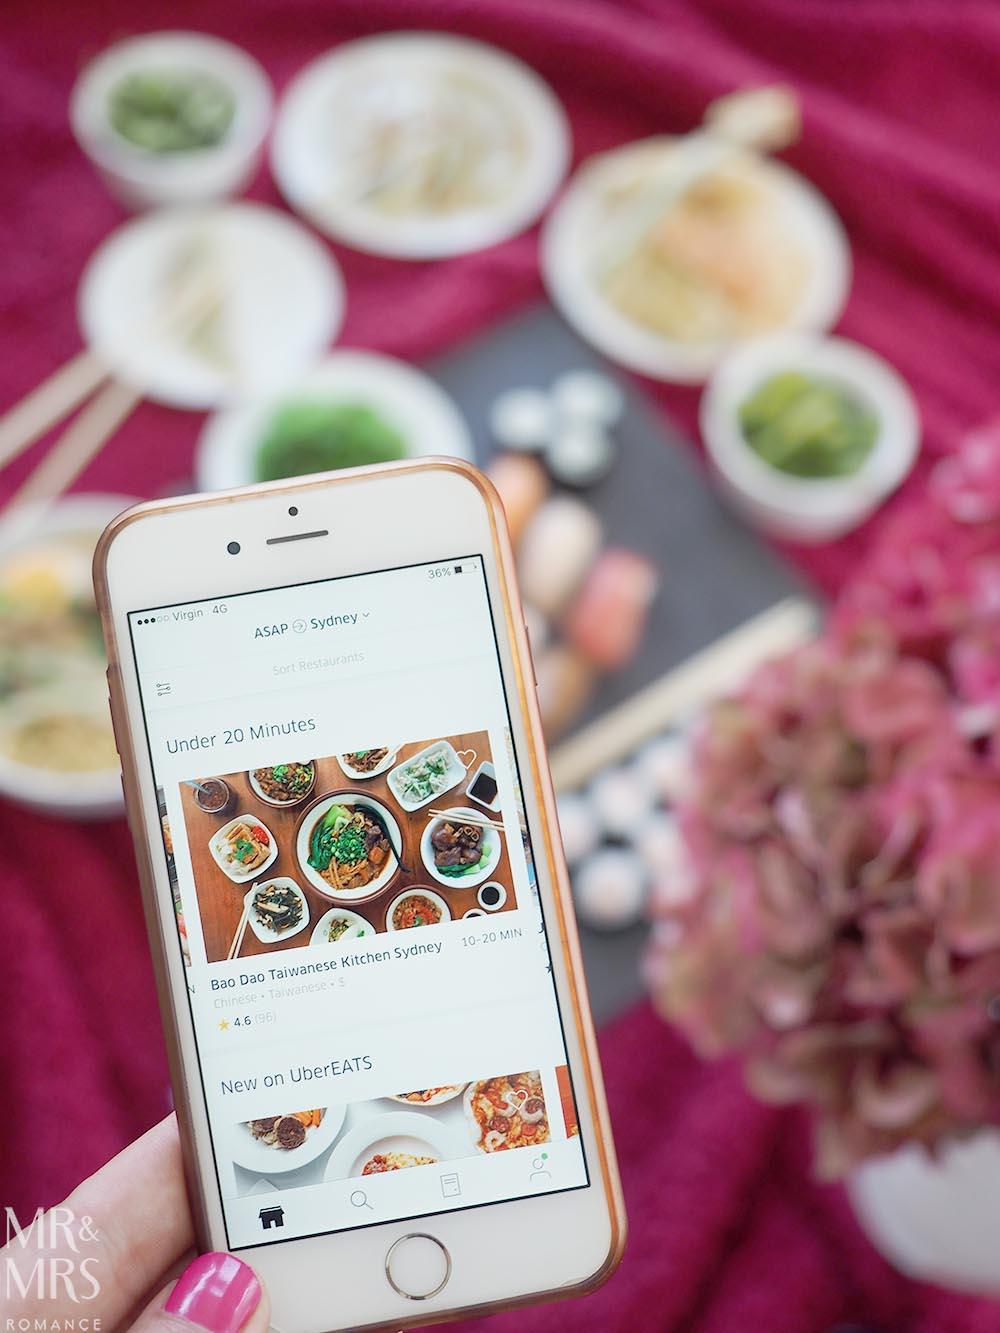 Uber Eats date night - Mr and Mrs Romance app